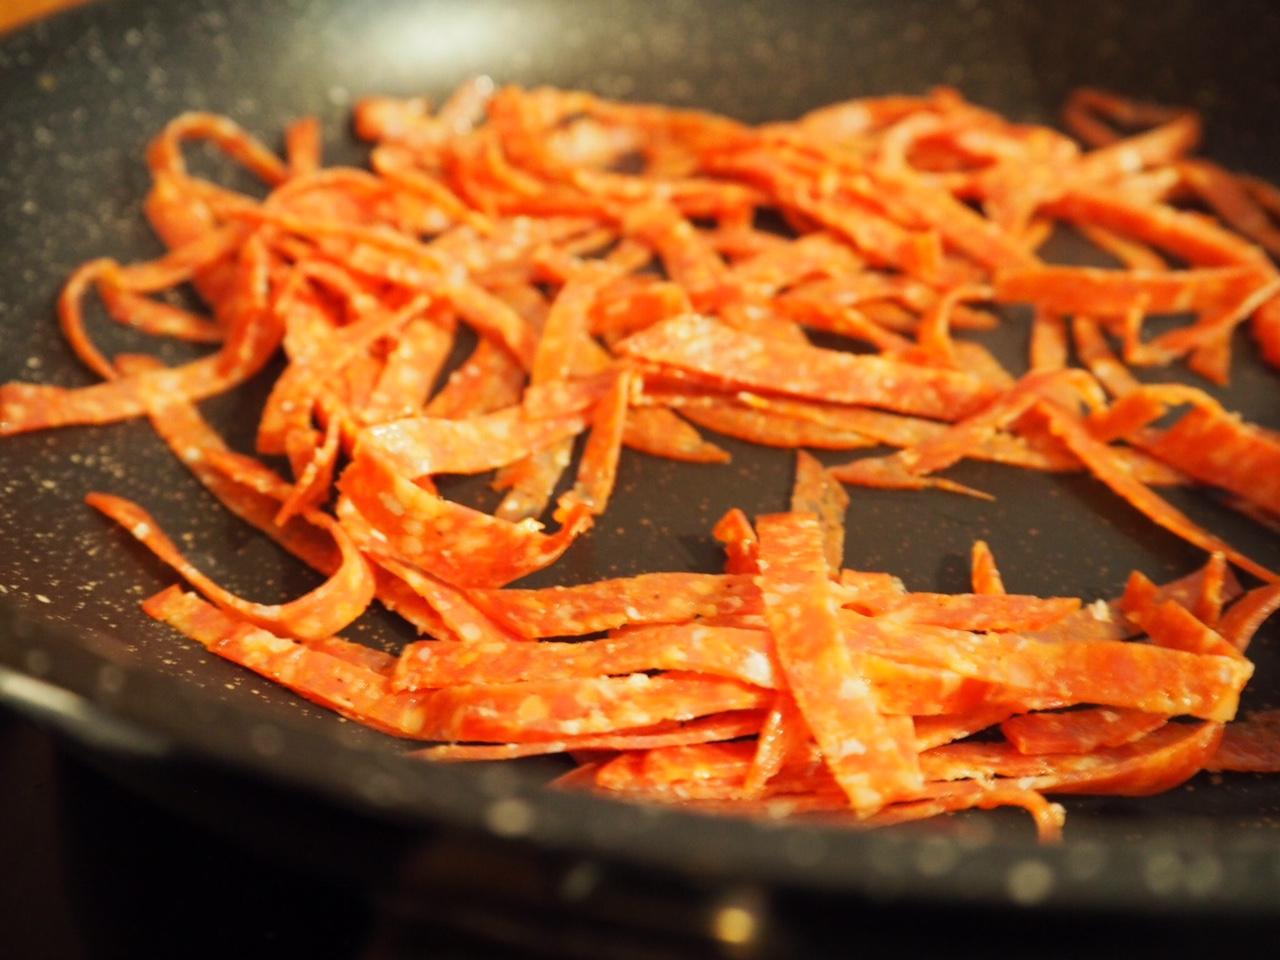 Crunchy Salami, Penne Pasta and Poor Man's Parmesan